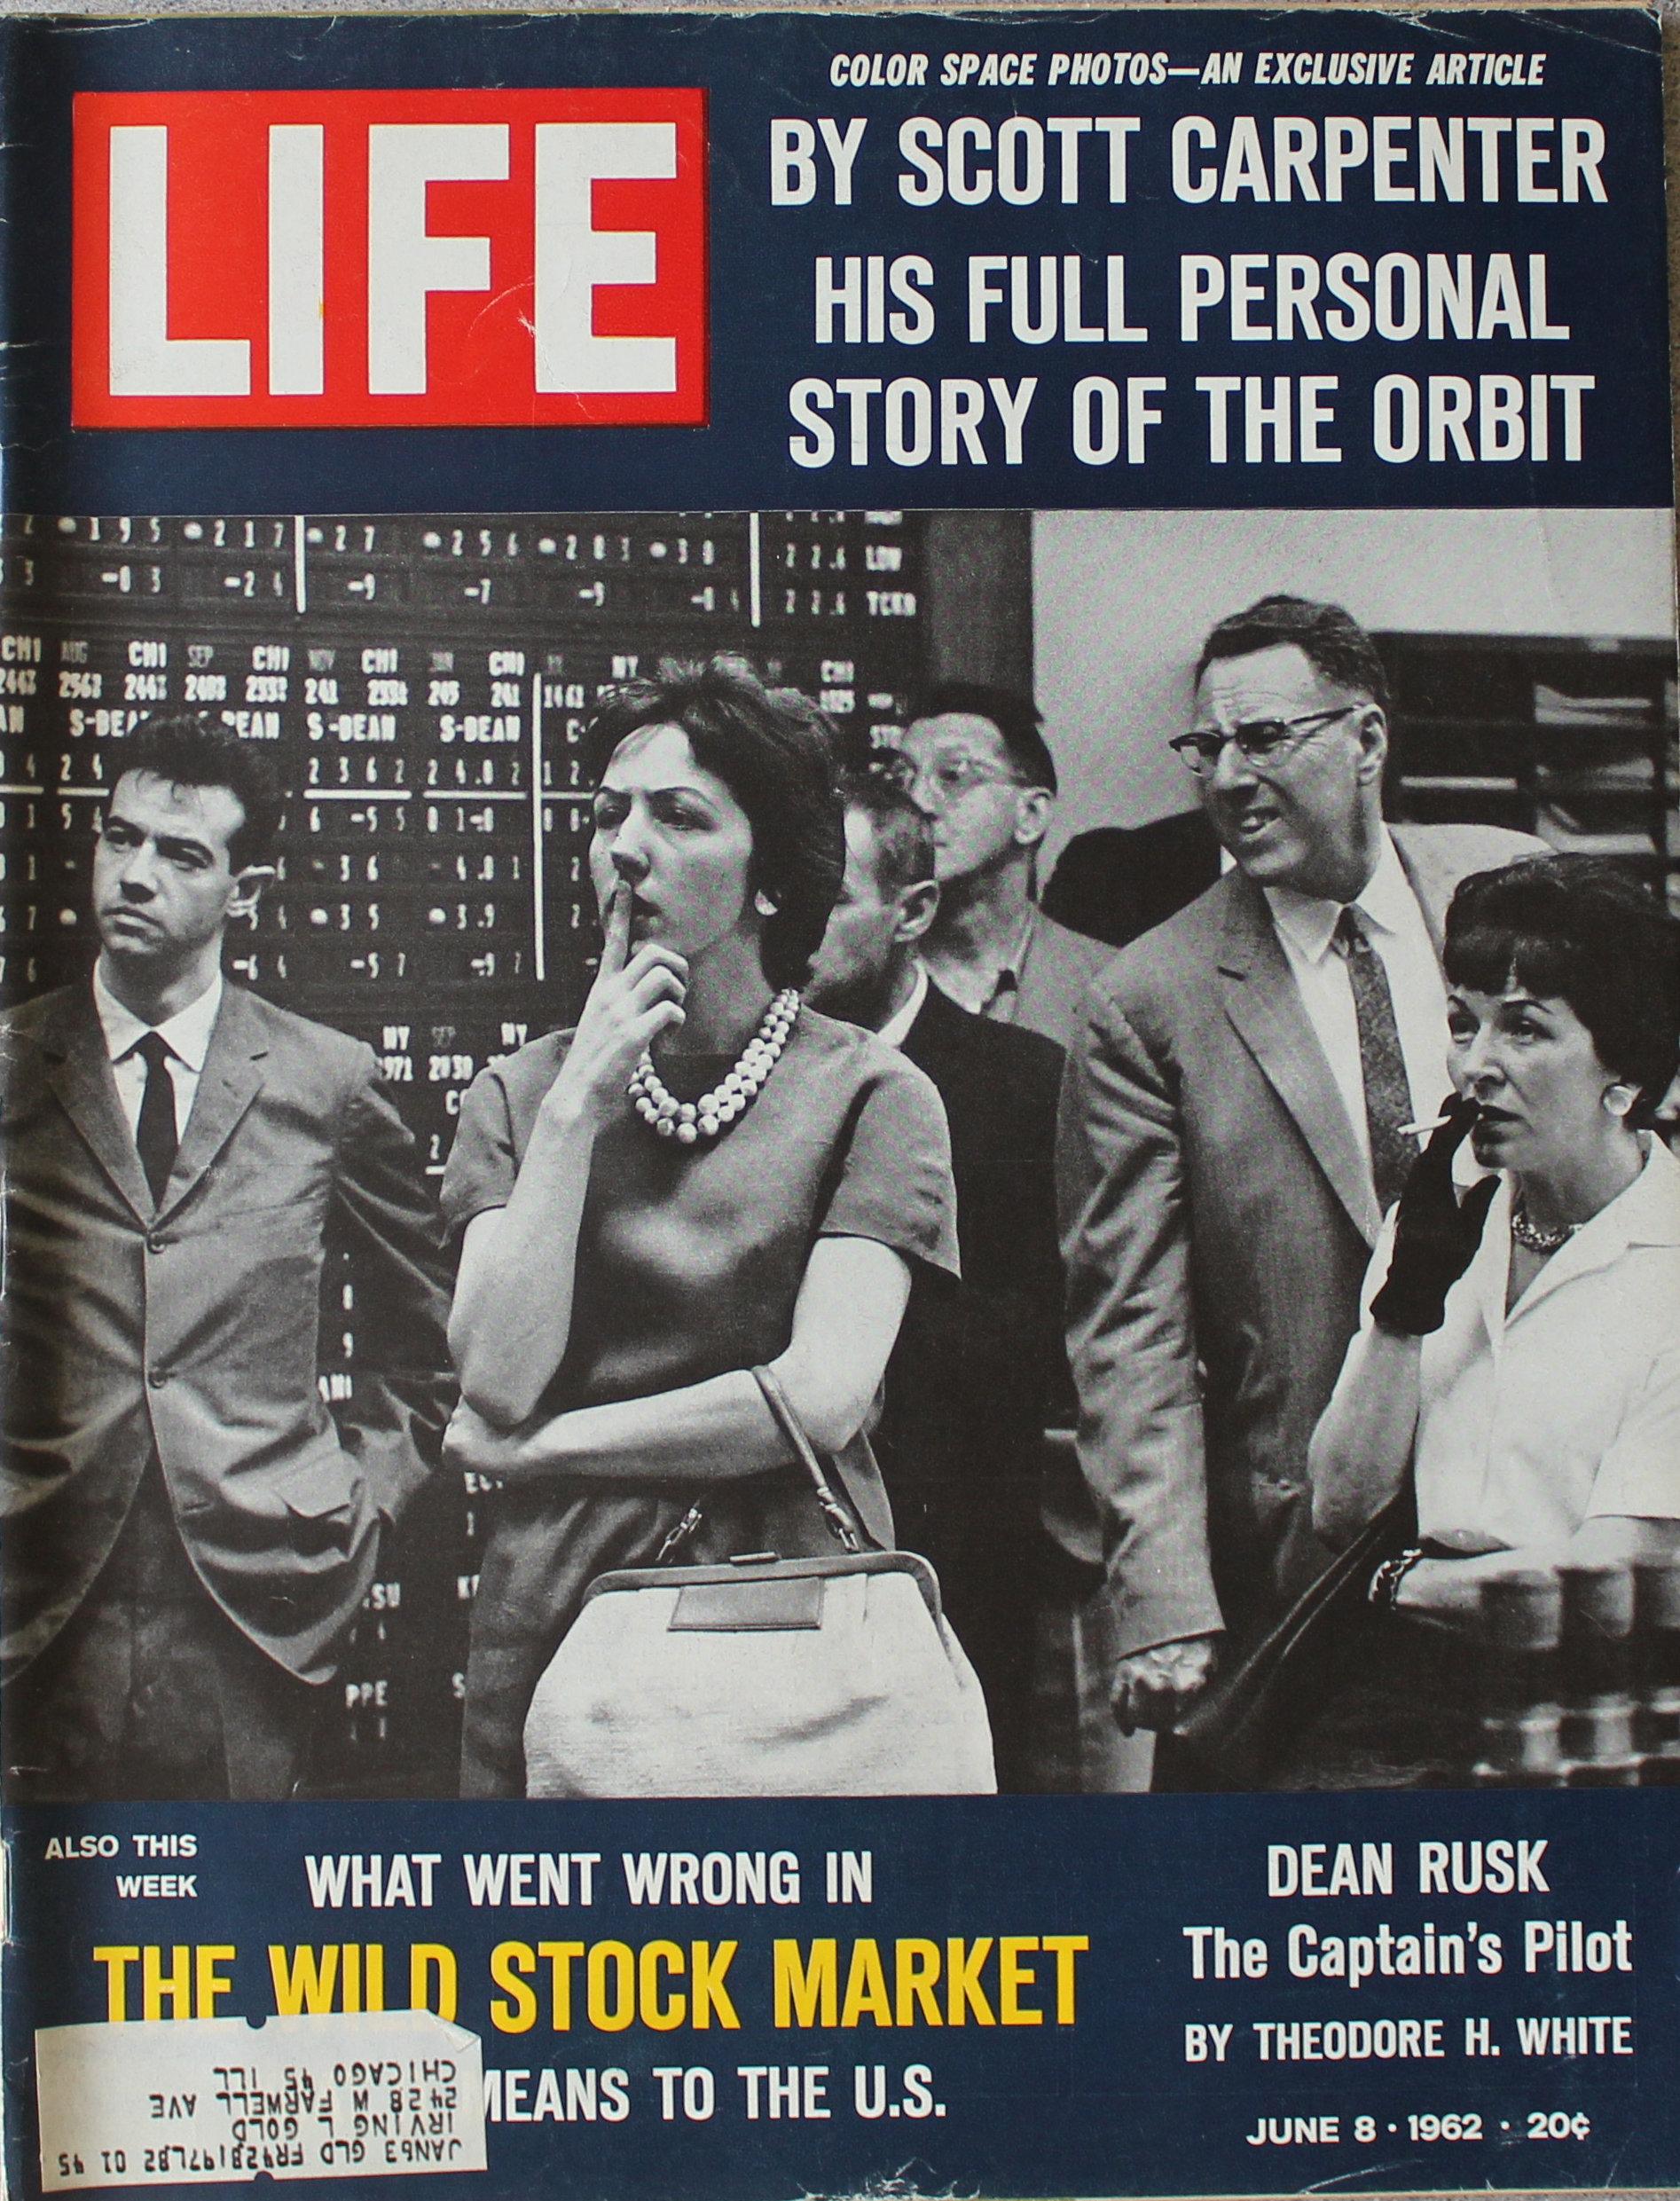 LIFE Jun 8, 1962